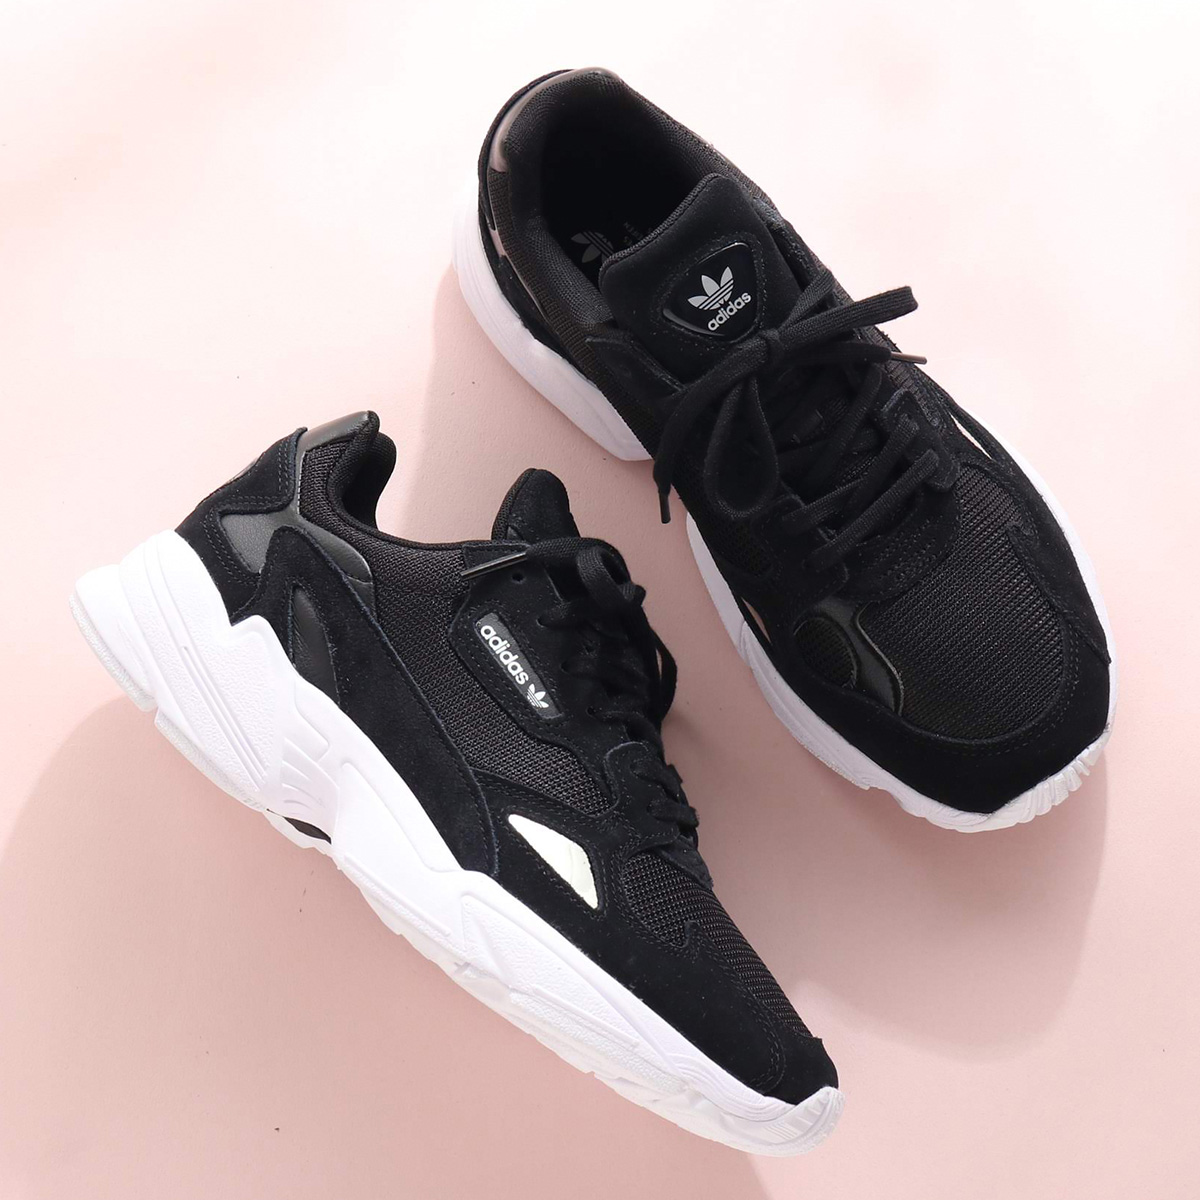 huge discount 99298 9a828 adidas Originals FALCON W (Adidas originals falcon W) CORE BLACK CORE BLACK RUNNING  WHITE 18FW-S